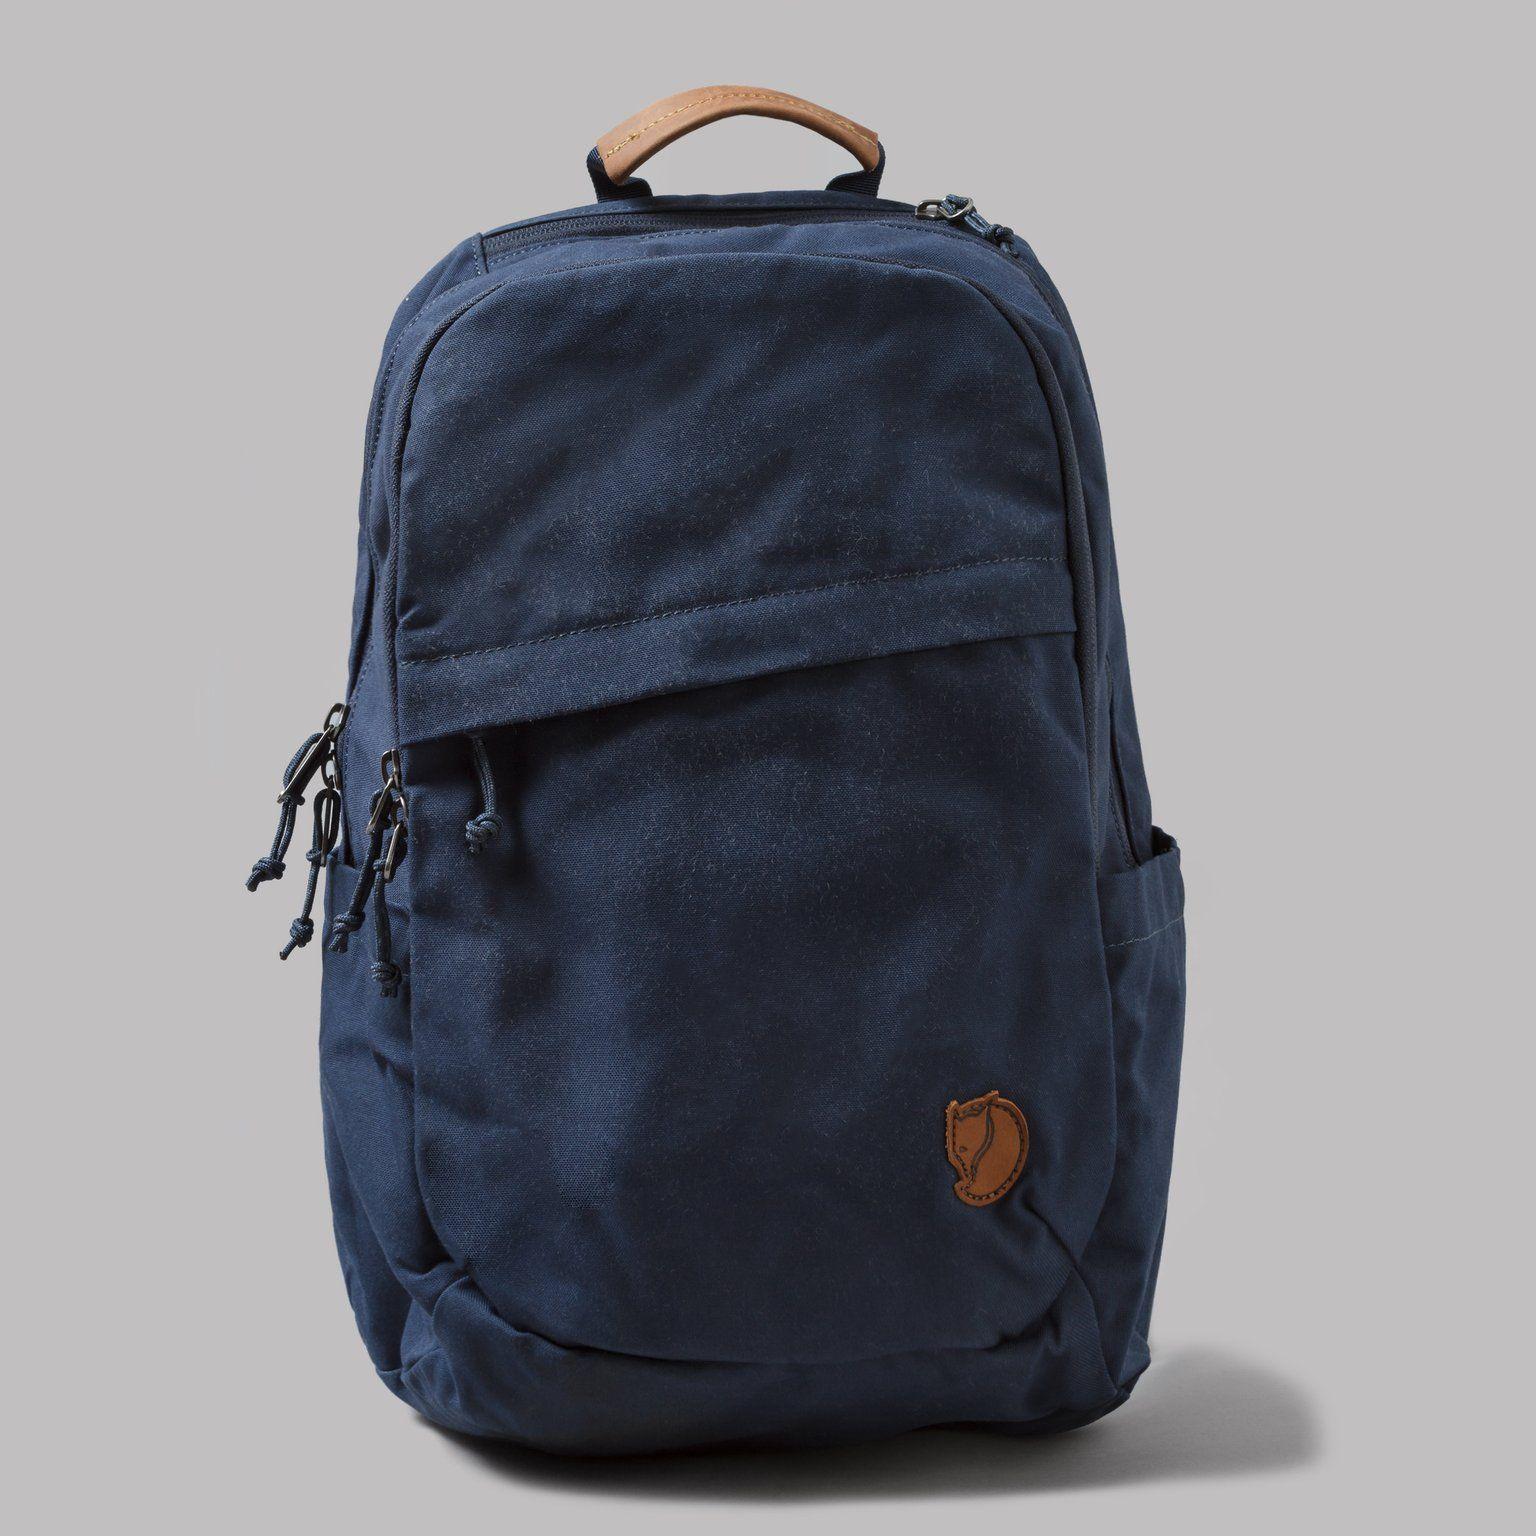 Naturaleza Hectáreas Coherente  Fjällräven Räven 20L Pack (Navy) | Bags, Bagpack, Backpacks